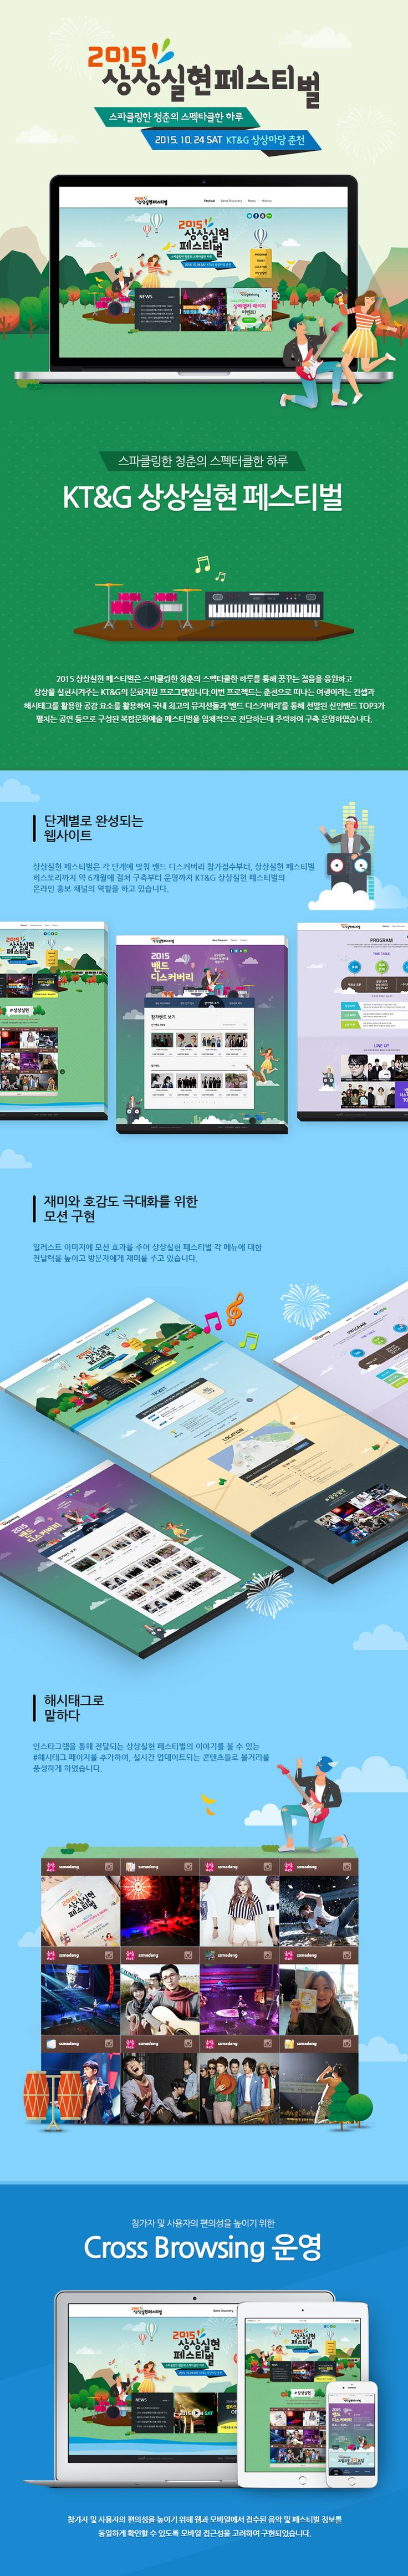 KT&G 상상실현 2015 웹사이트 구축